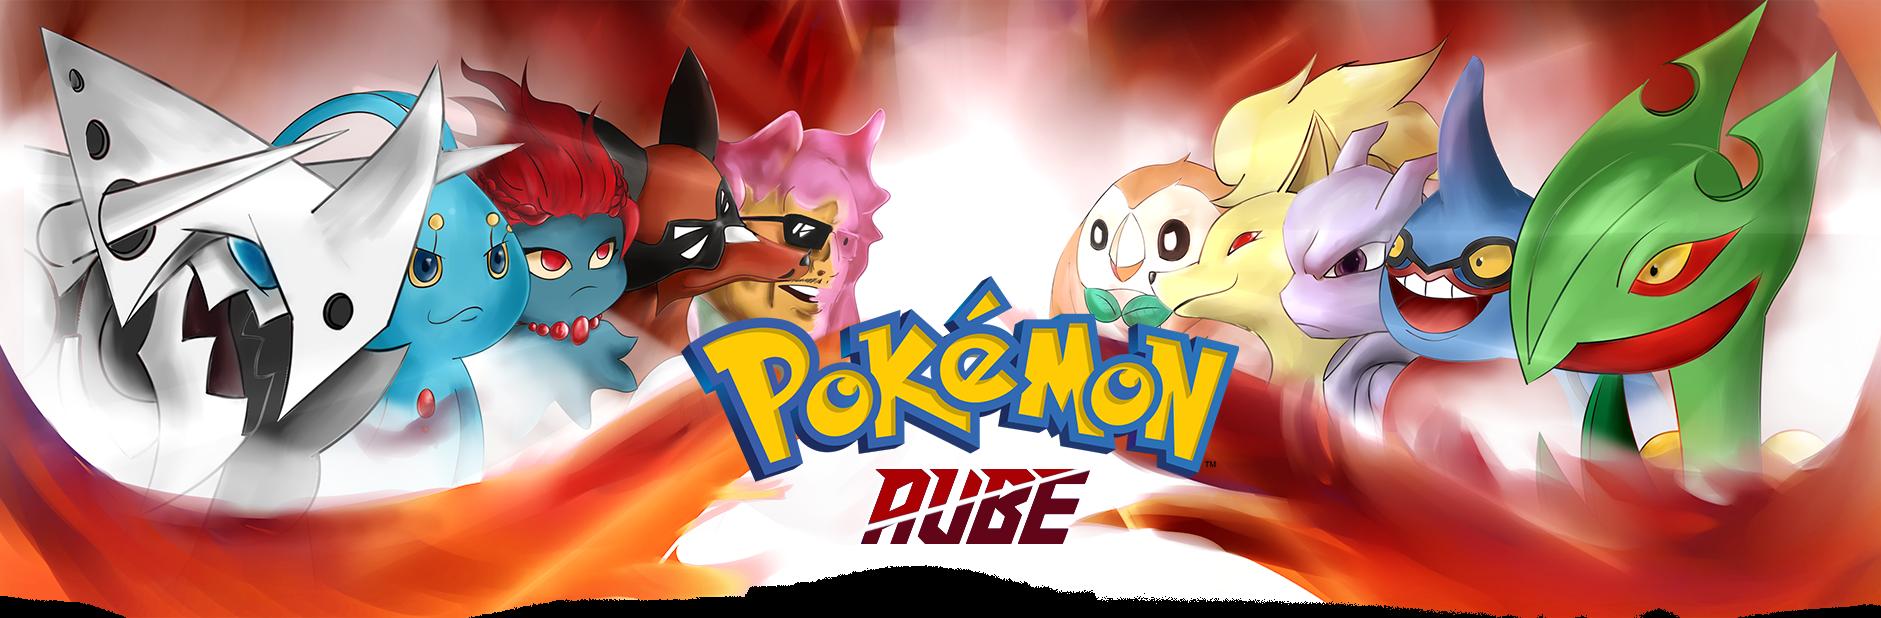 Pokémon Aube Saison 4